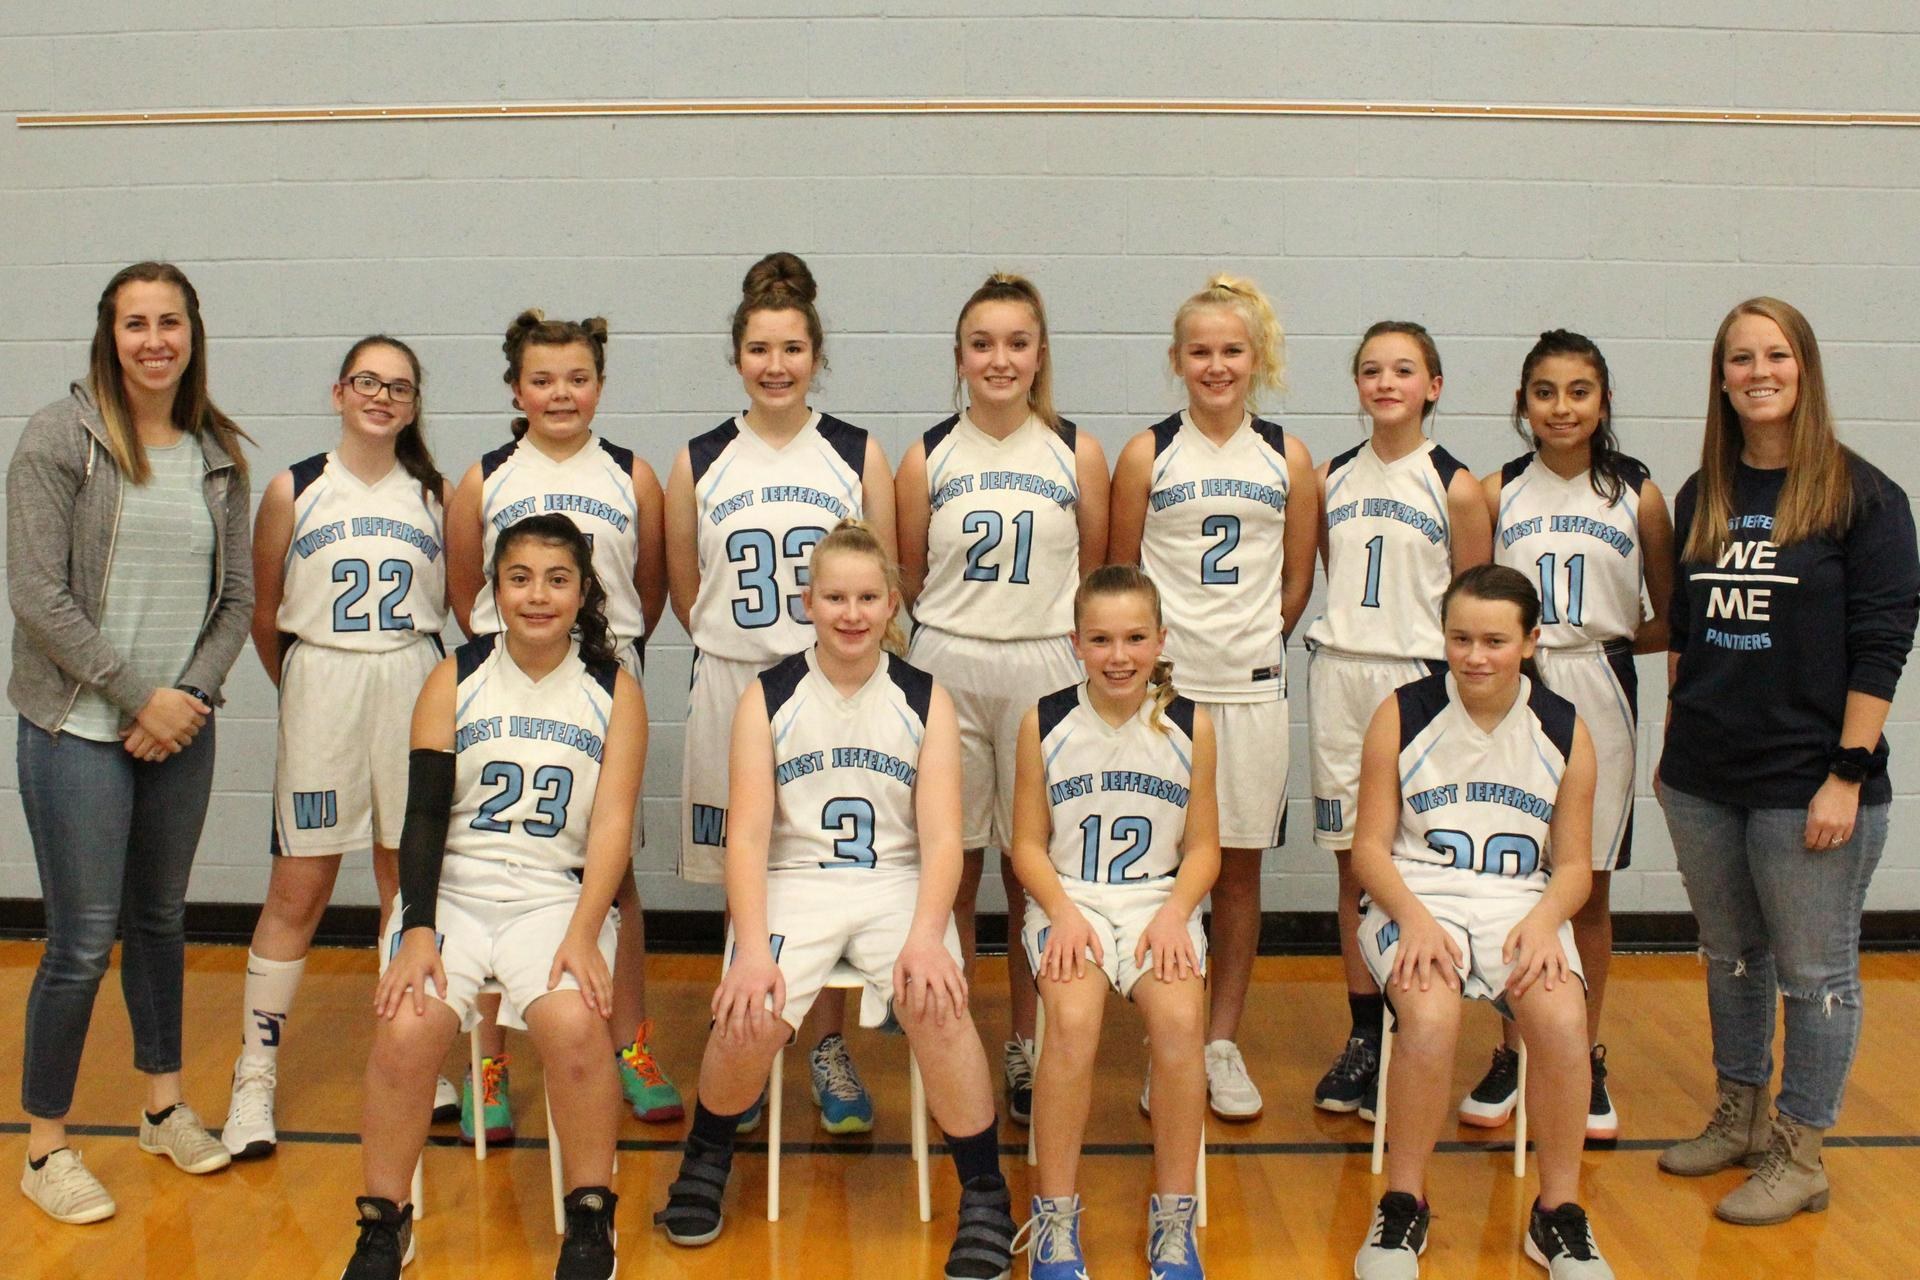 7th Grade Girls Bball Team